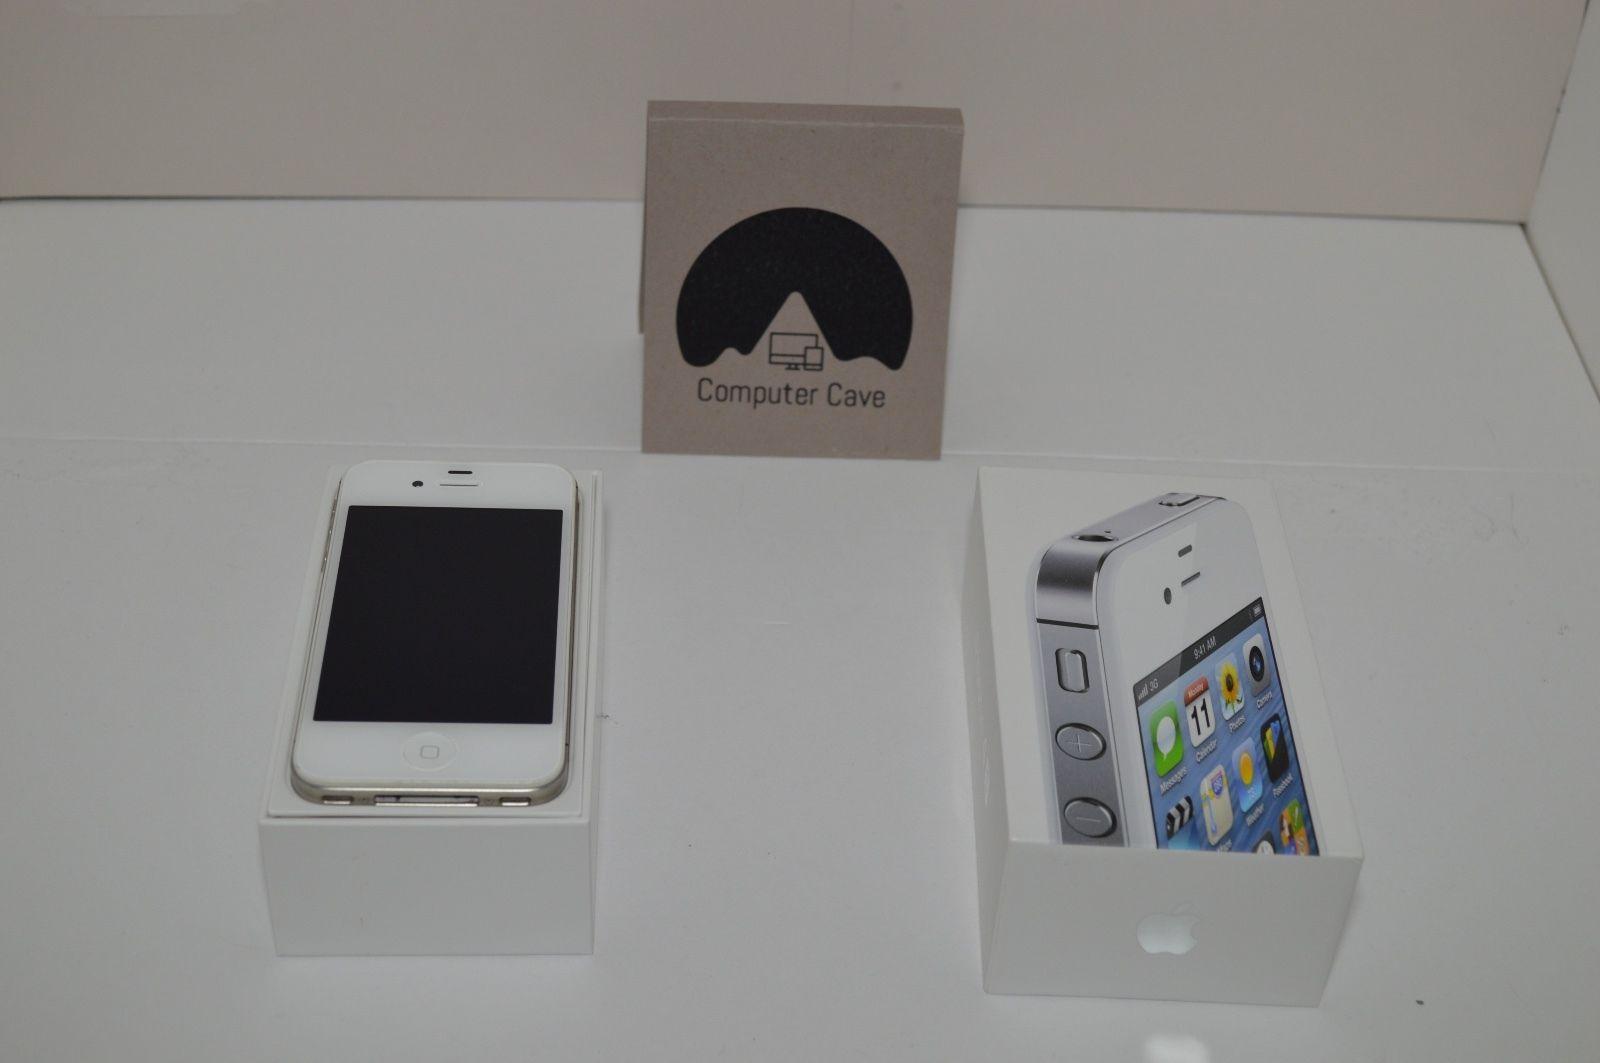 Apple iPhone 4S White 16 GB Unlocked Verizon Bundled w/ Original Box and Charger https://t.co/BFilJQCEXD https://t.co/jTJvdvAVd1